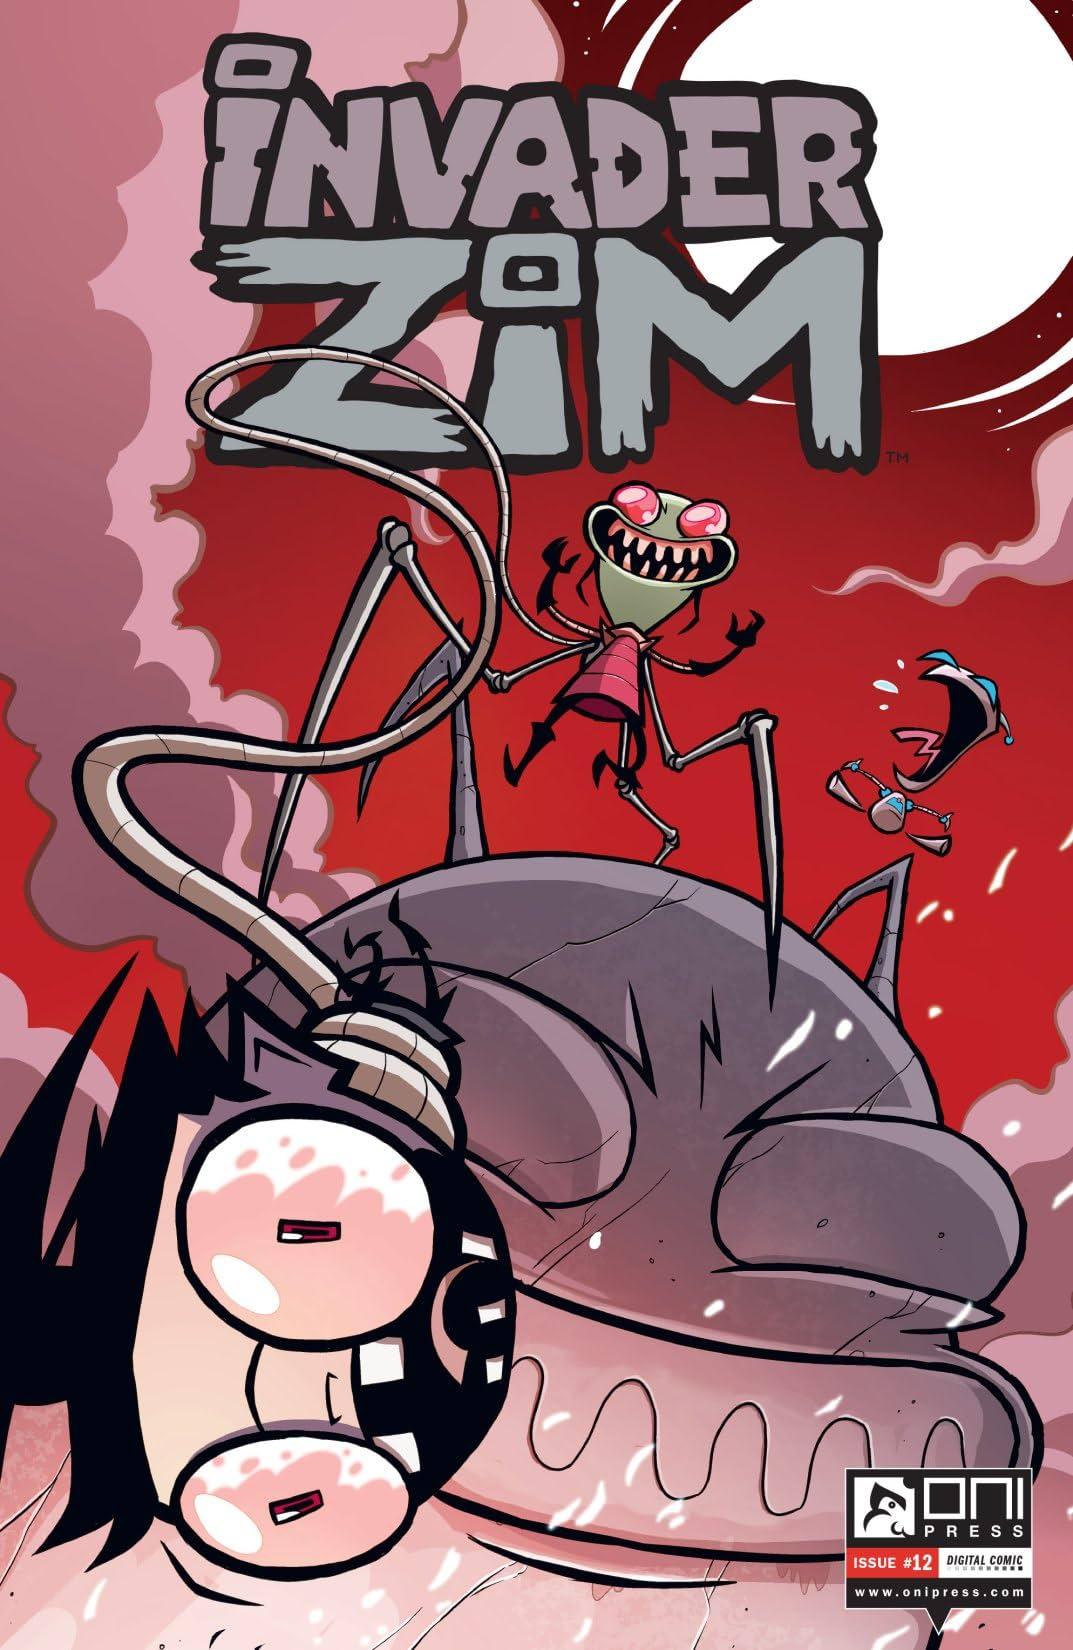 Invader Zim #12